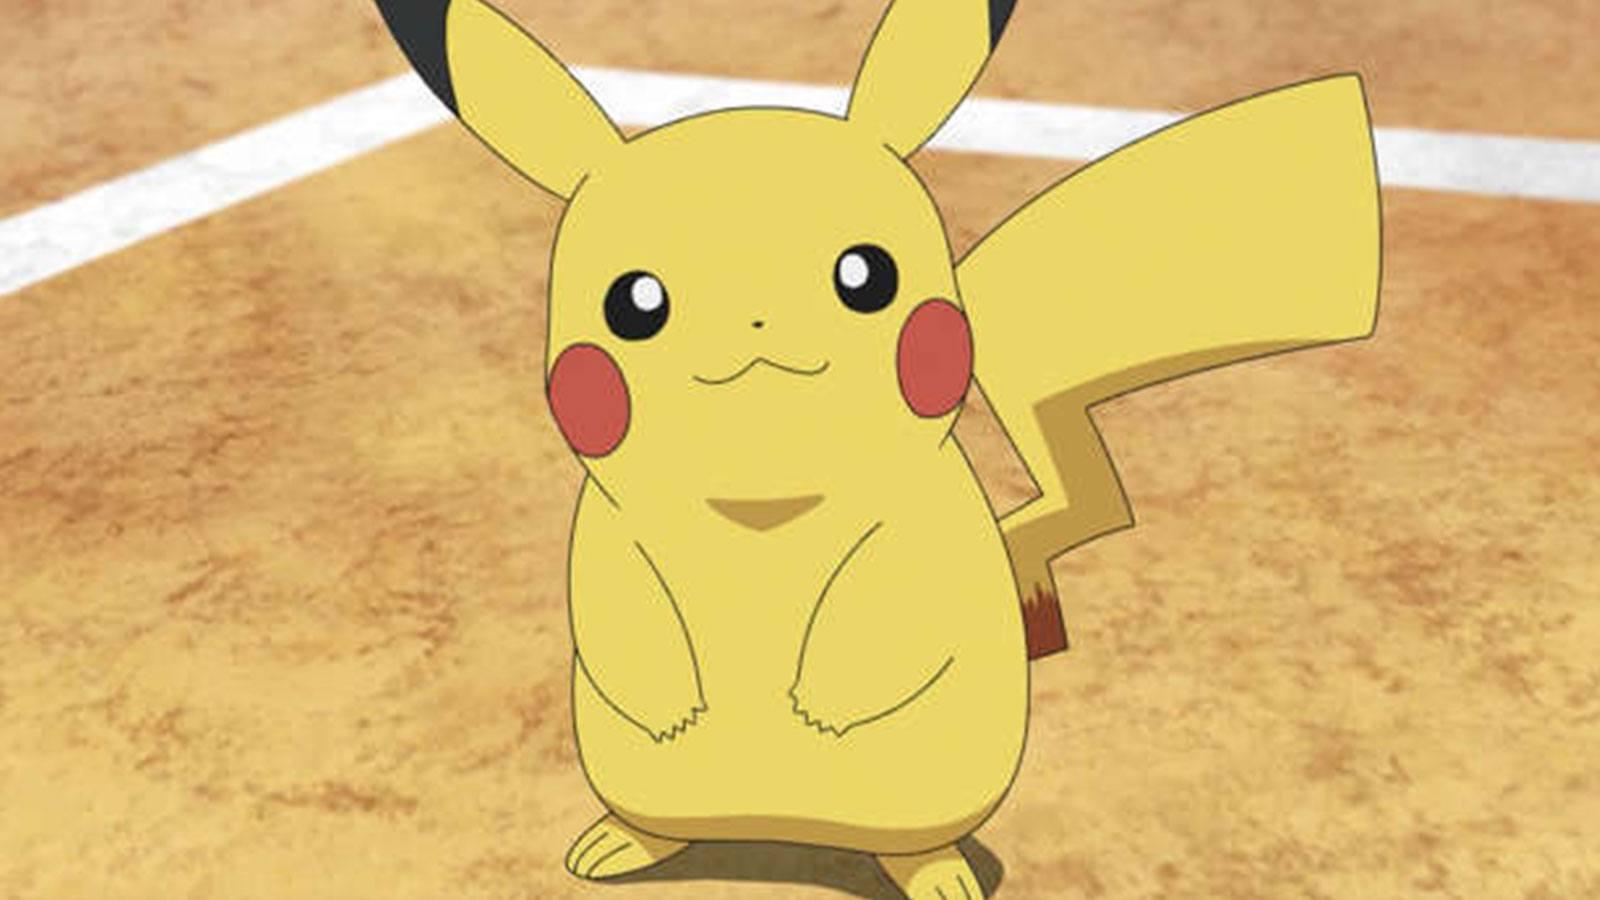 Pokémon dessin animé Pikachu